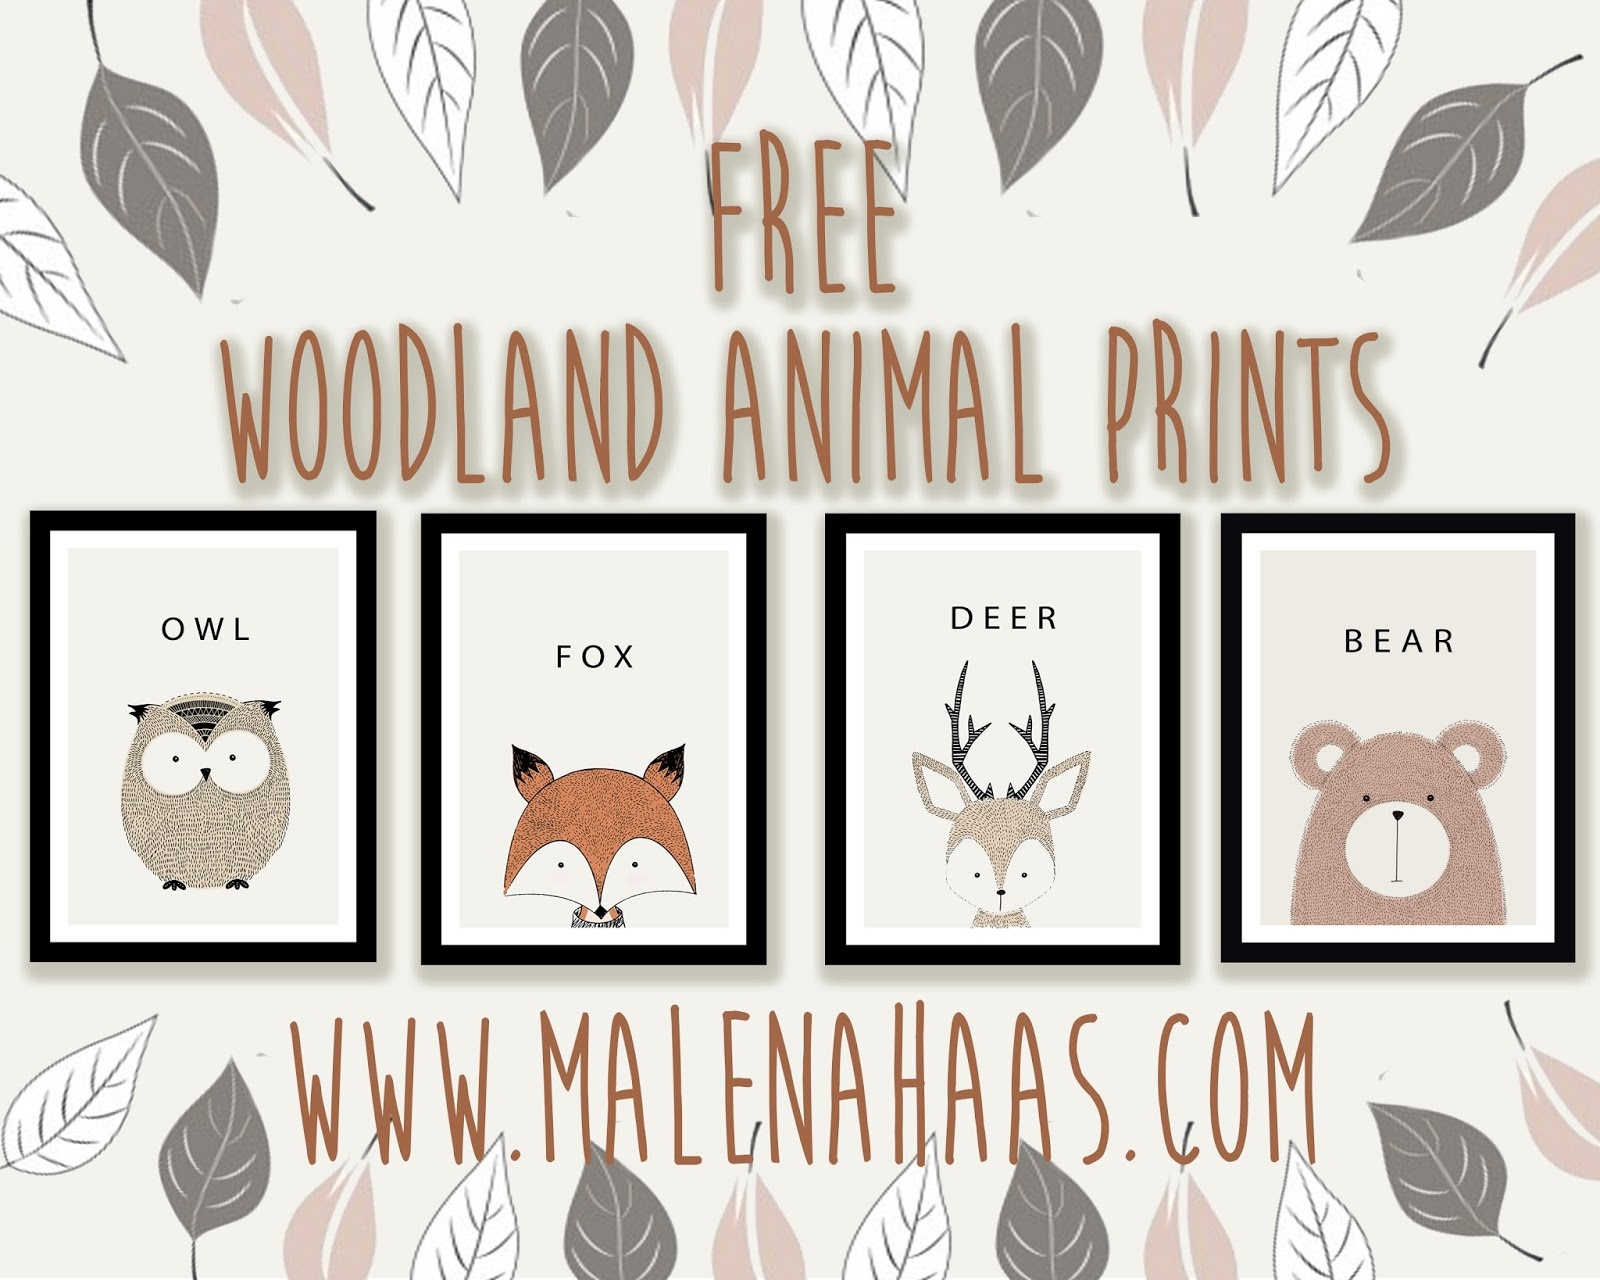 Malena Haas: Free Woodland Animal Printables - Free Woodland Animal Printables